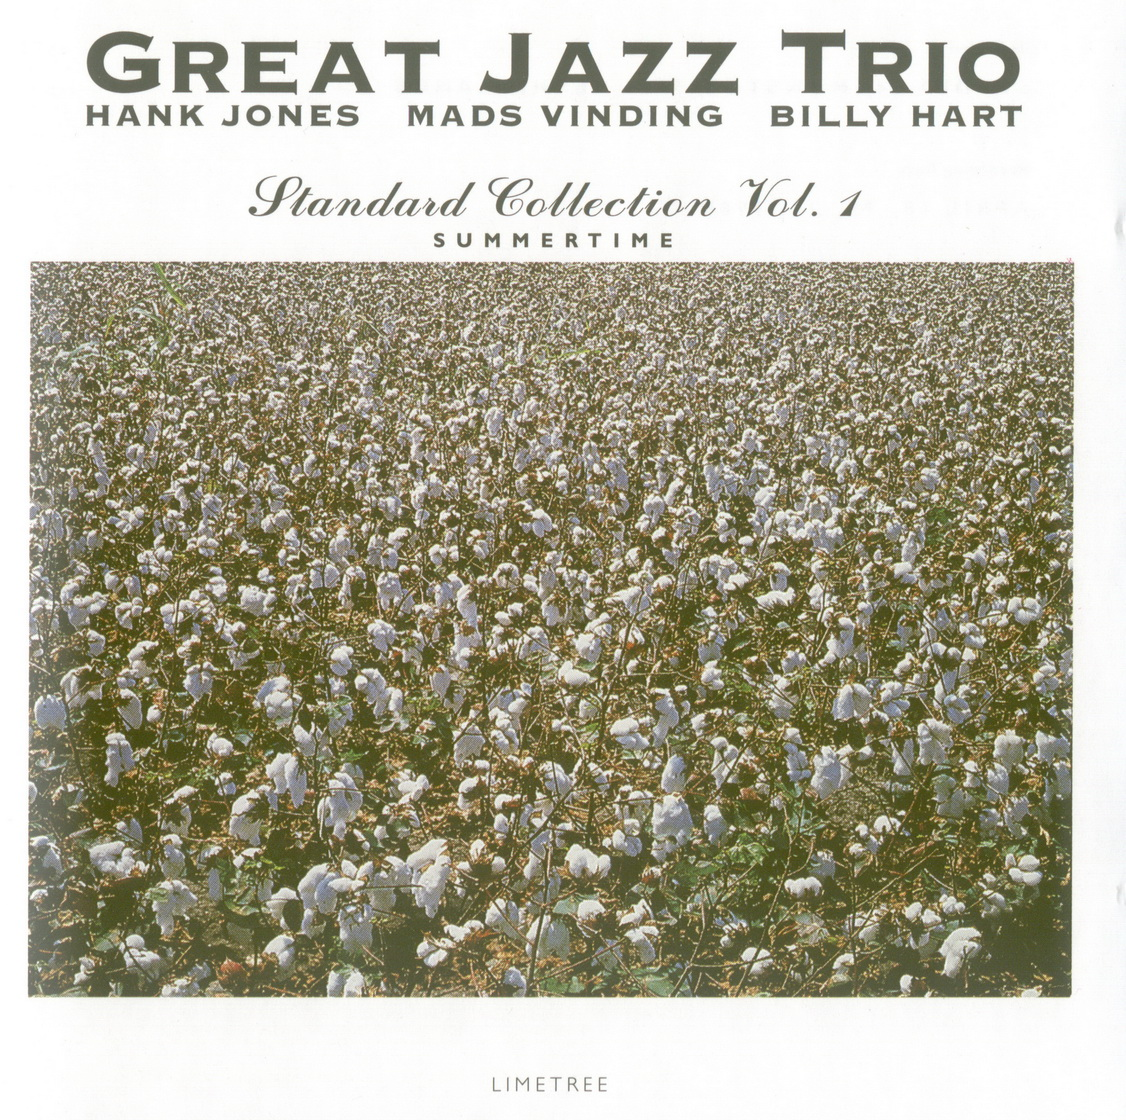 Great Jazz Trio - Standard Collection Vol.1: Summertime (1988)